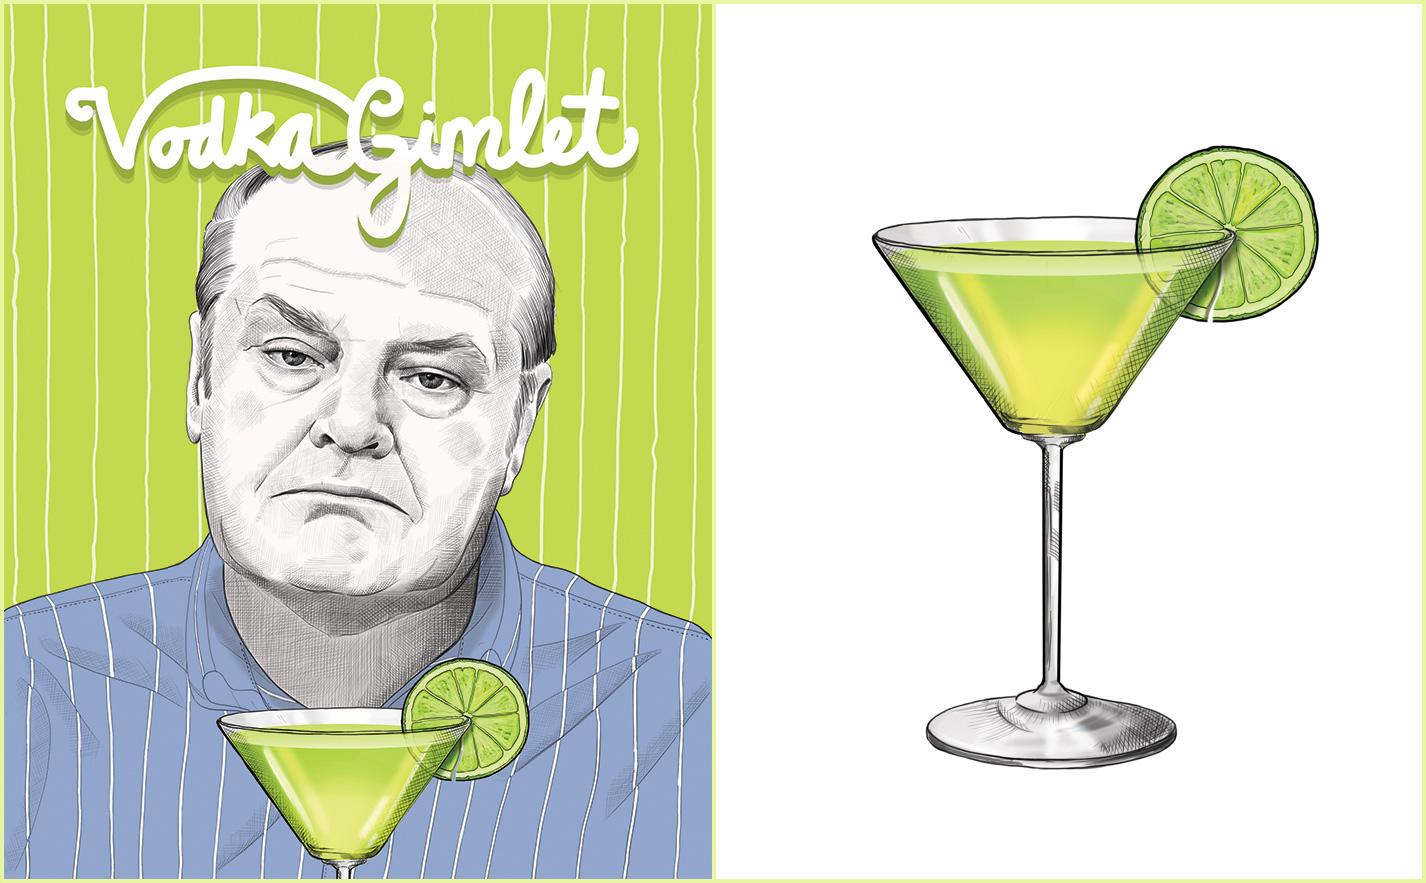 Vodka Gimlet Recipe - Jack Nicholson